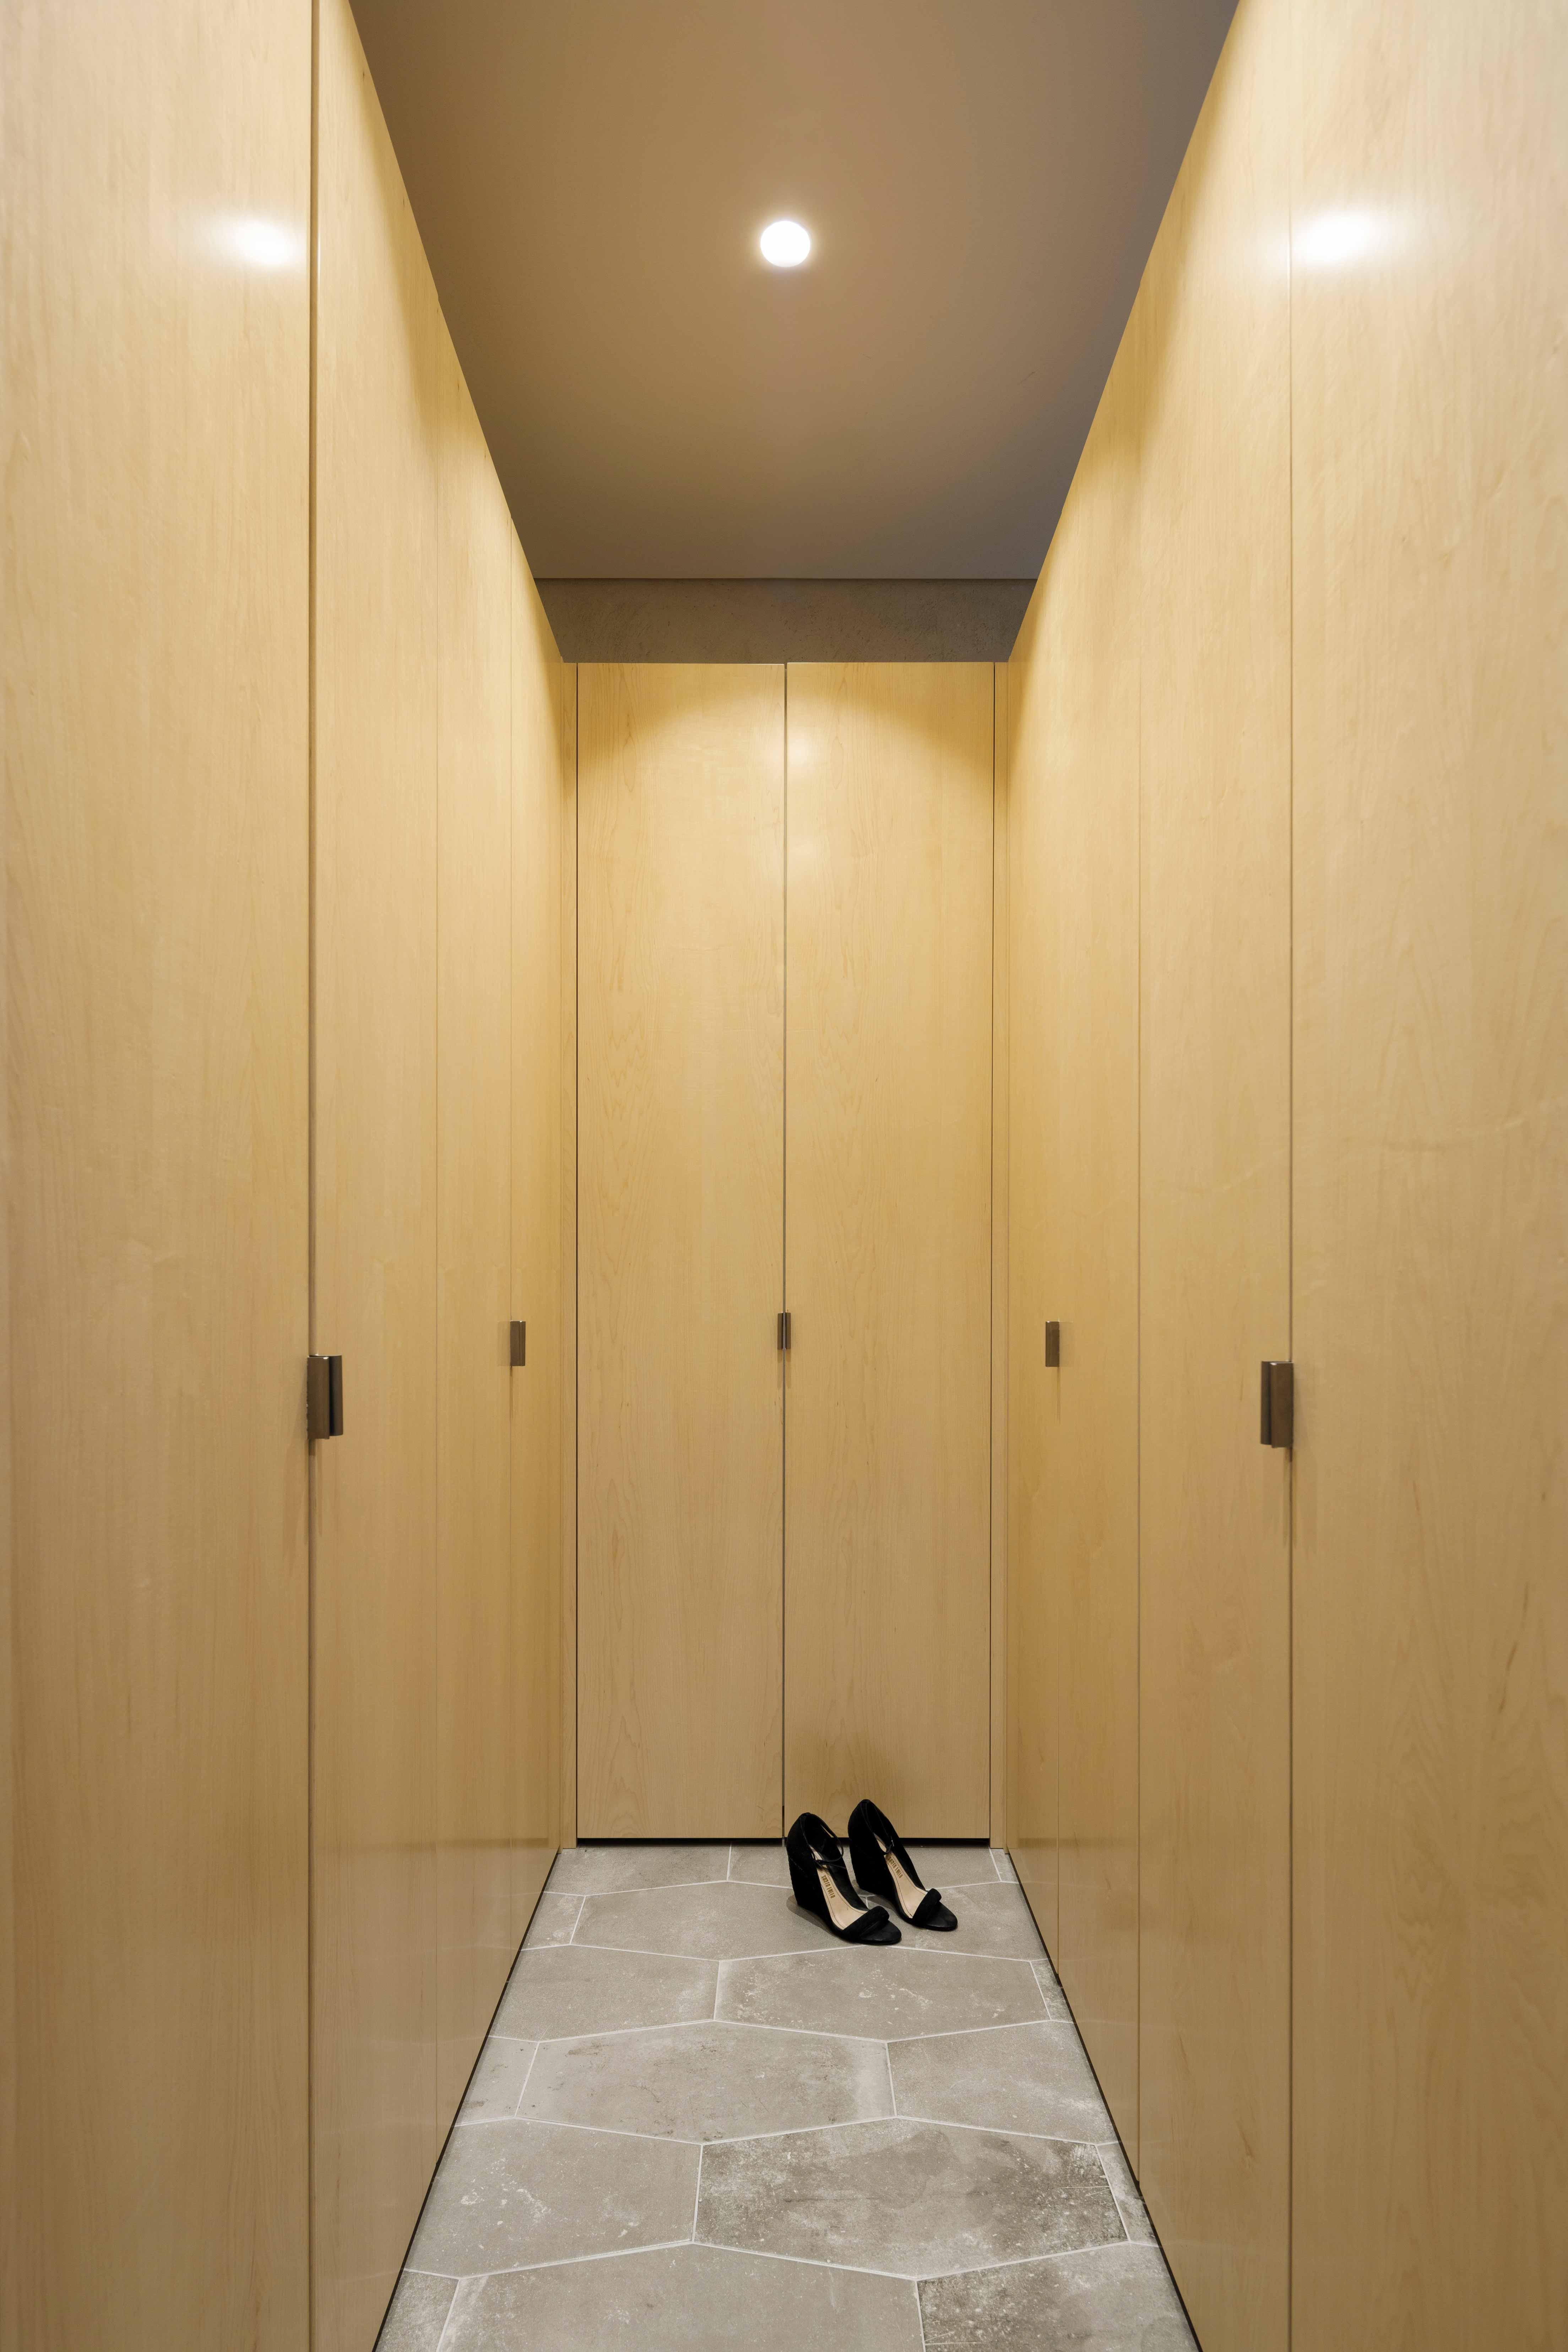 Paulo Moreira architectures